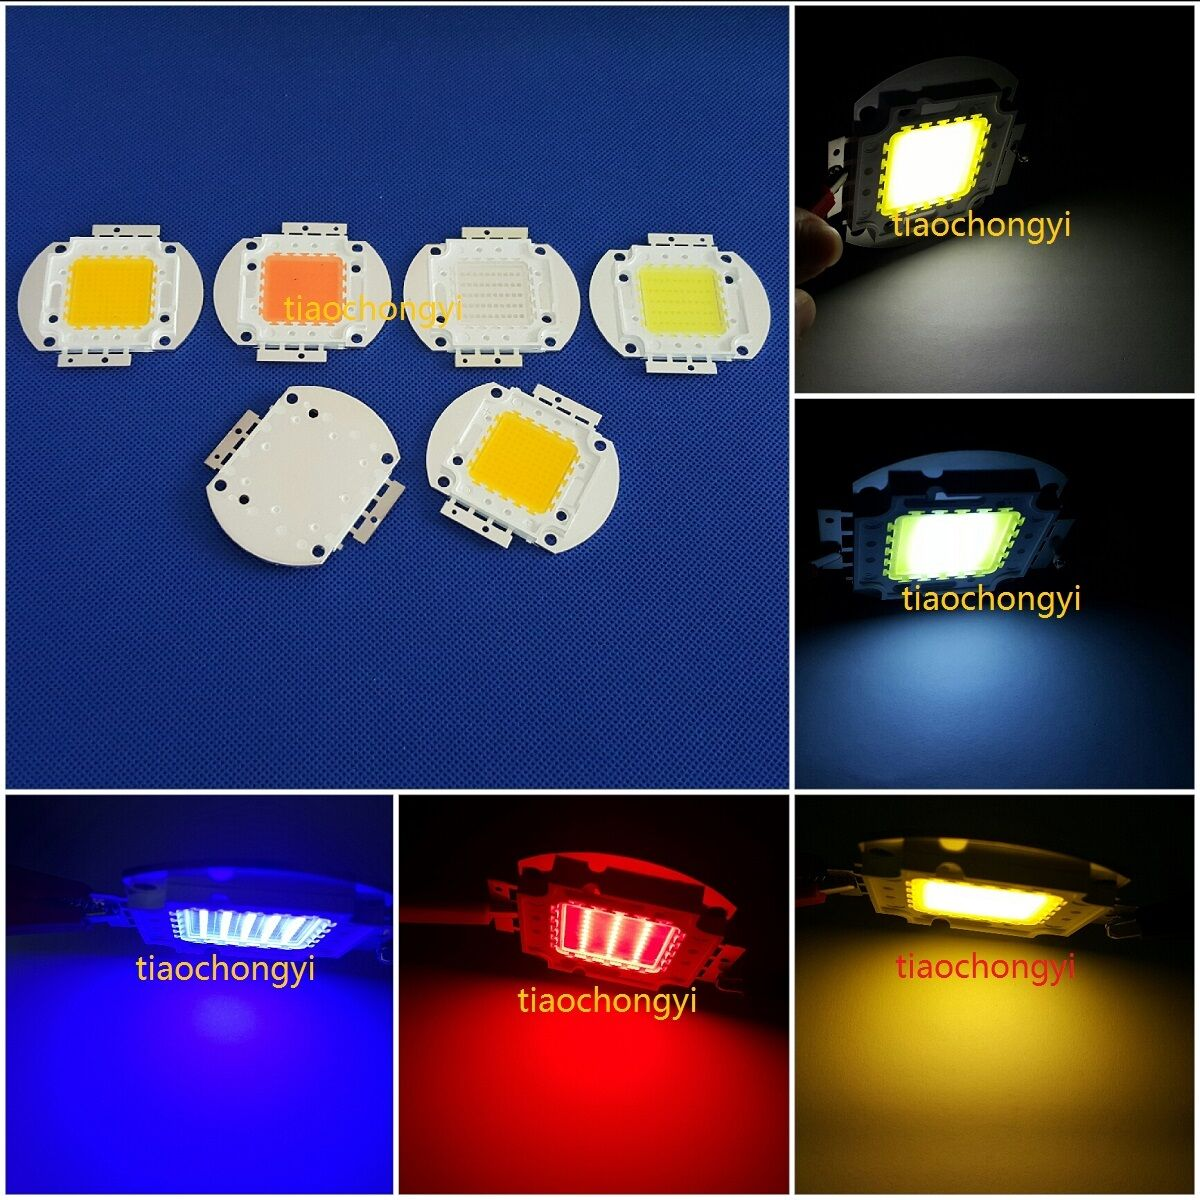 100W Alta Potencia LED Full Spectrum 660nm 850nm 940nm 395nm 365nm 6000k 30000k